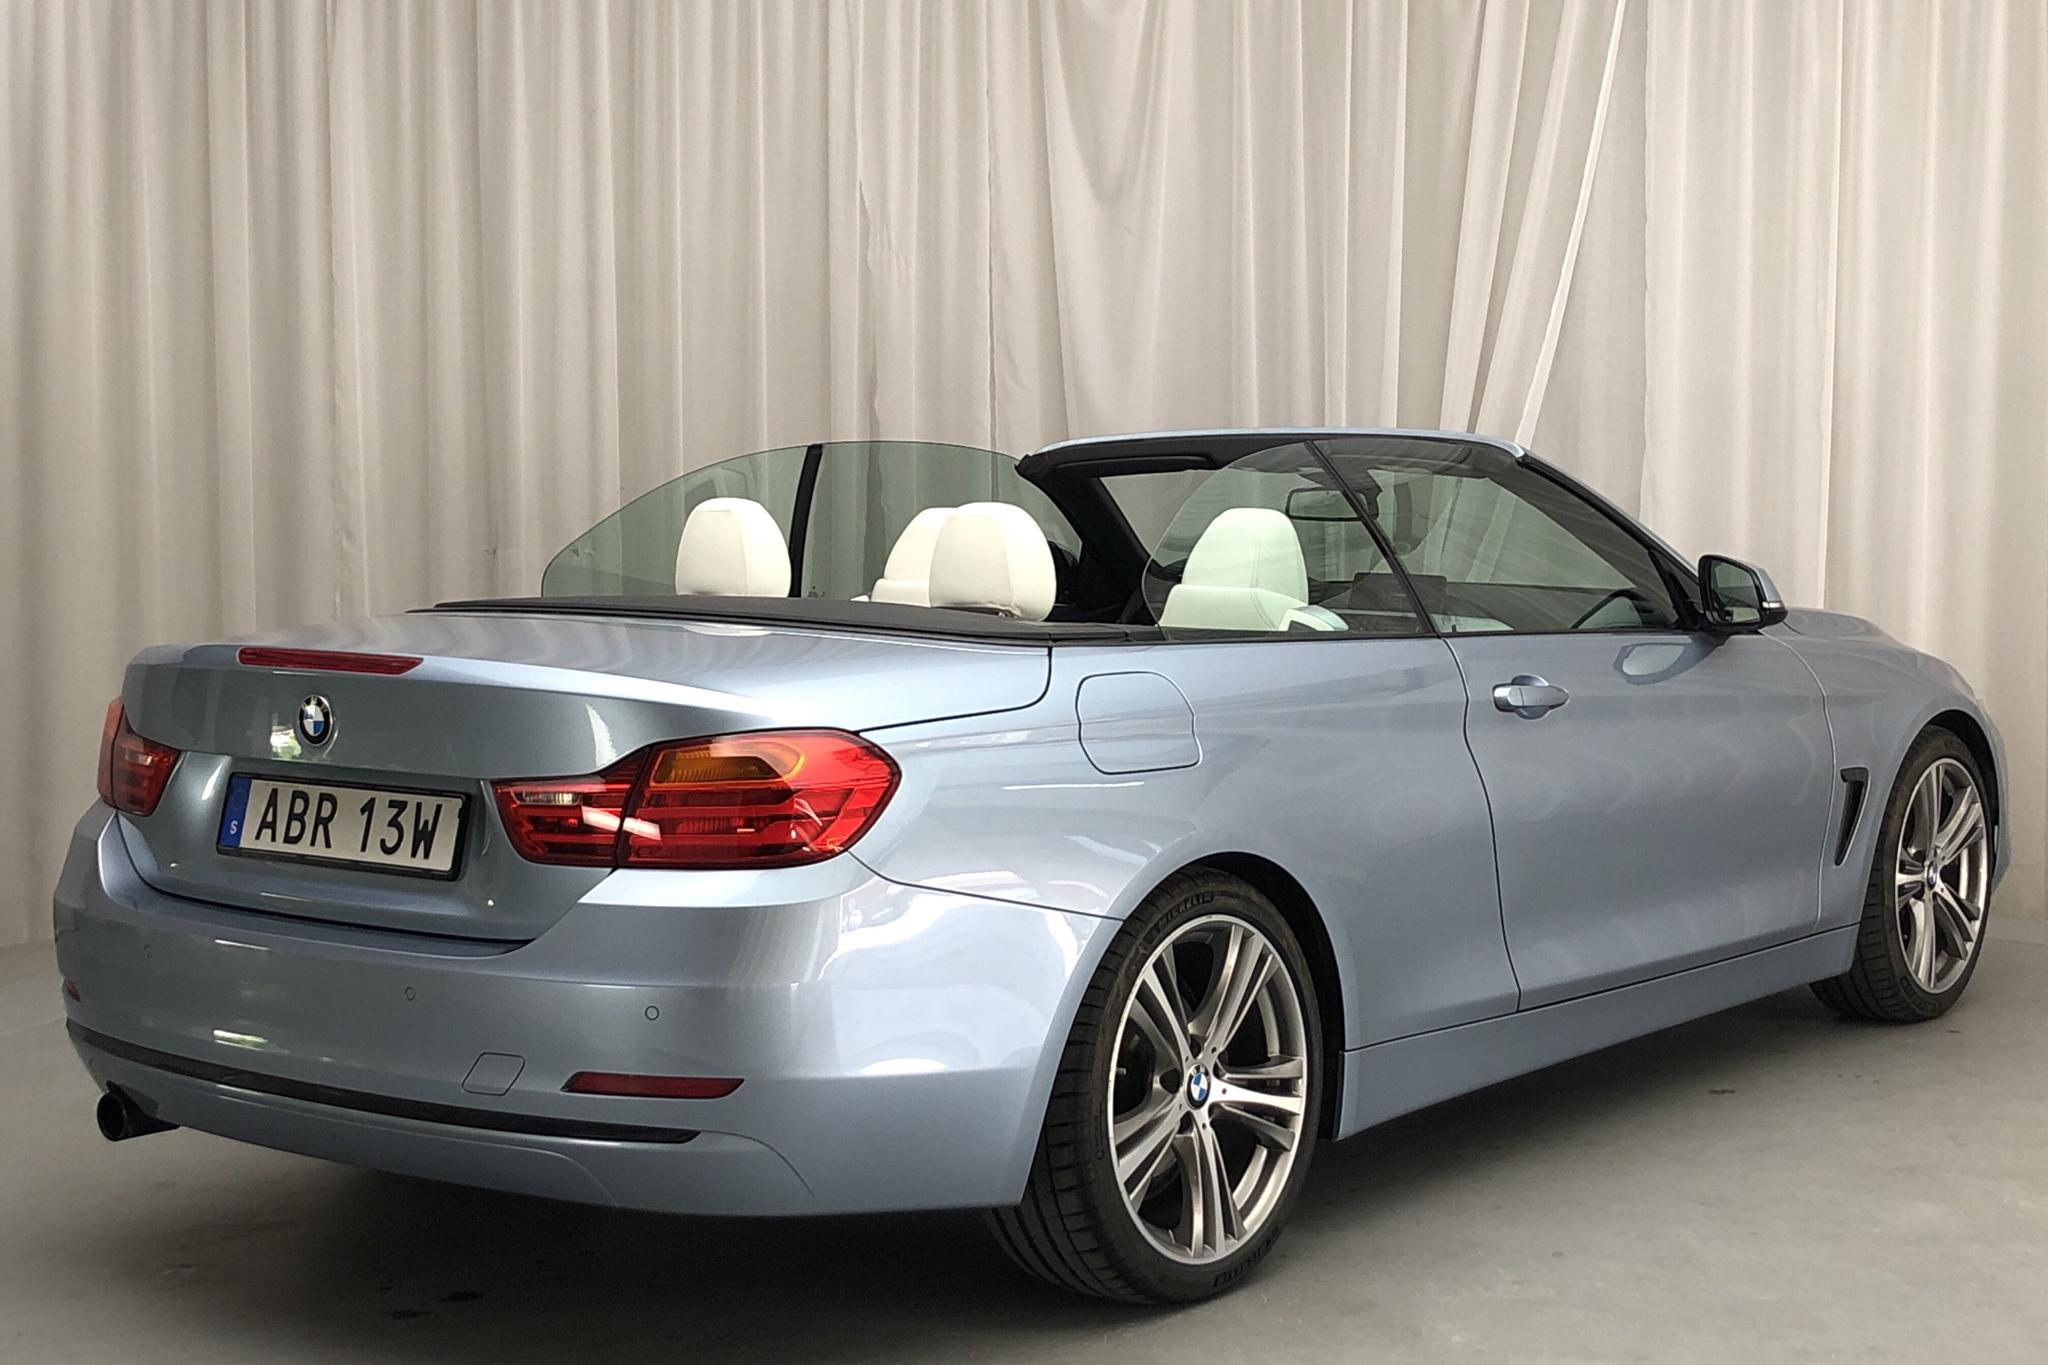 BMW 420i Cabriolet, F33 (184hk) - 29 980 km - Manual - Light Blue - 2015